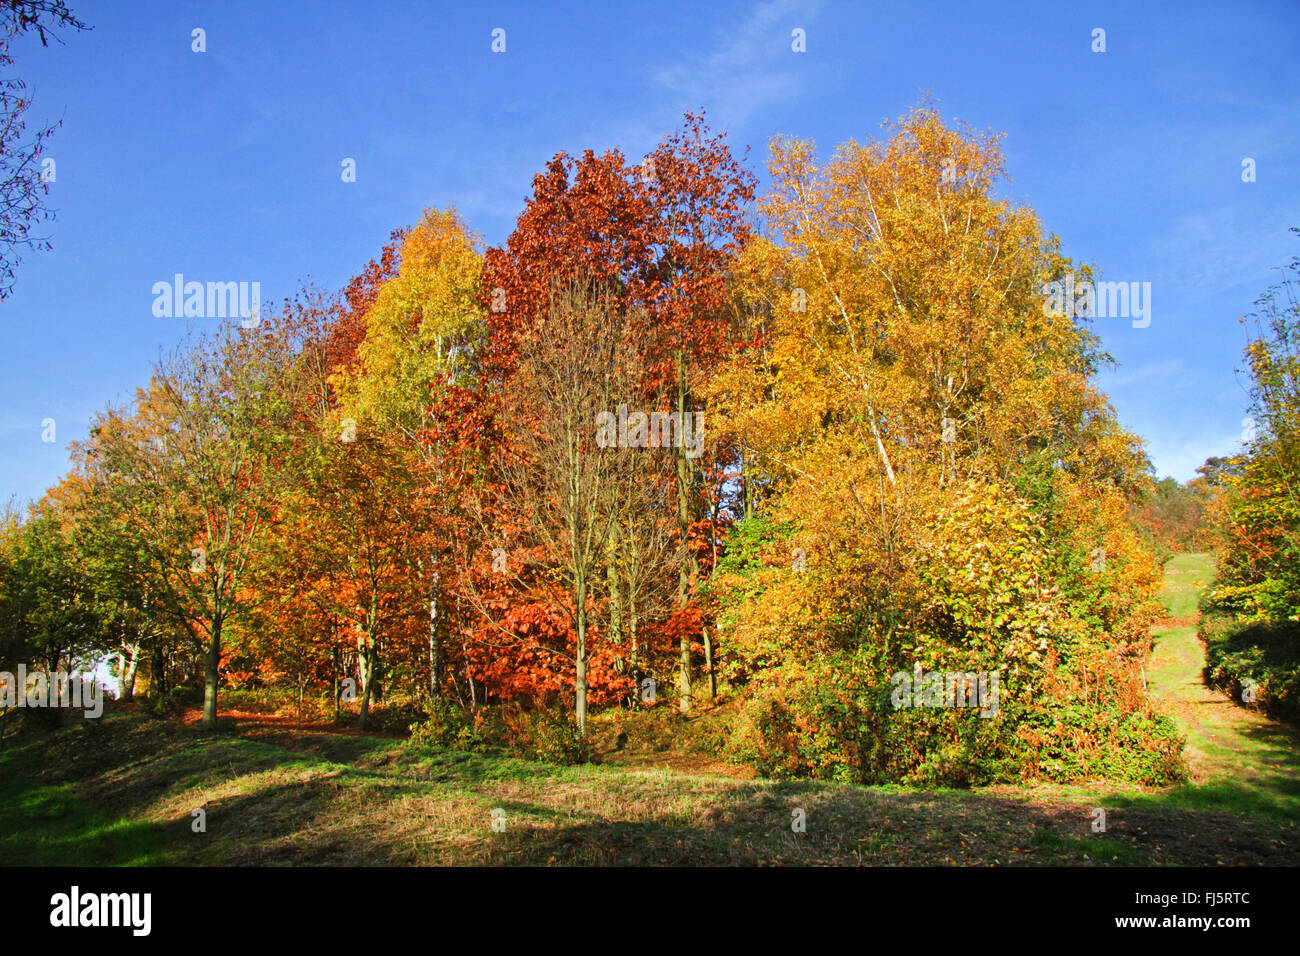 nature reserve Mechtenberg in Essen-Kray in autumn, Germany, North Rhine-Westphalia, Ruhr Area, Essen - Stock Image